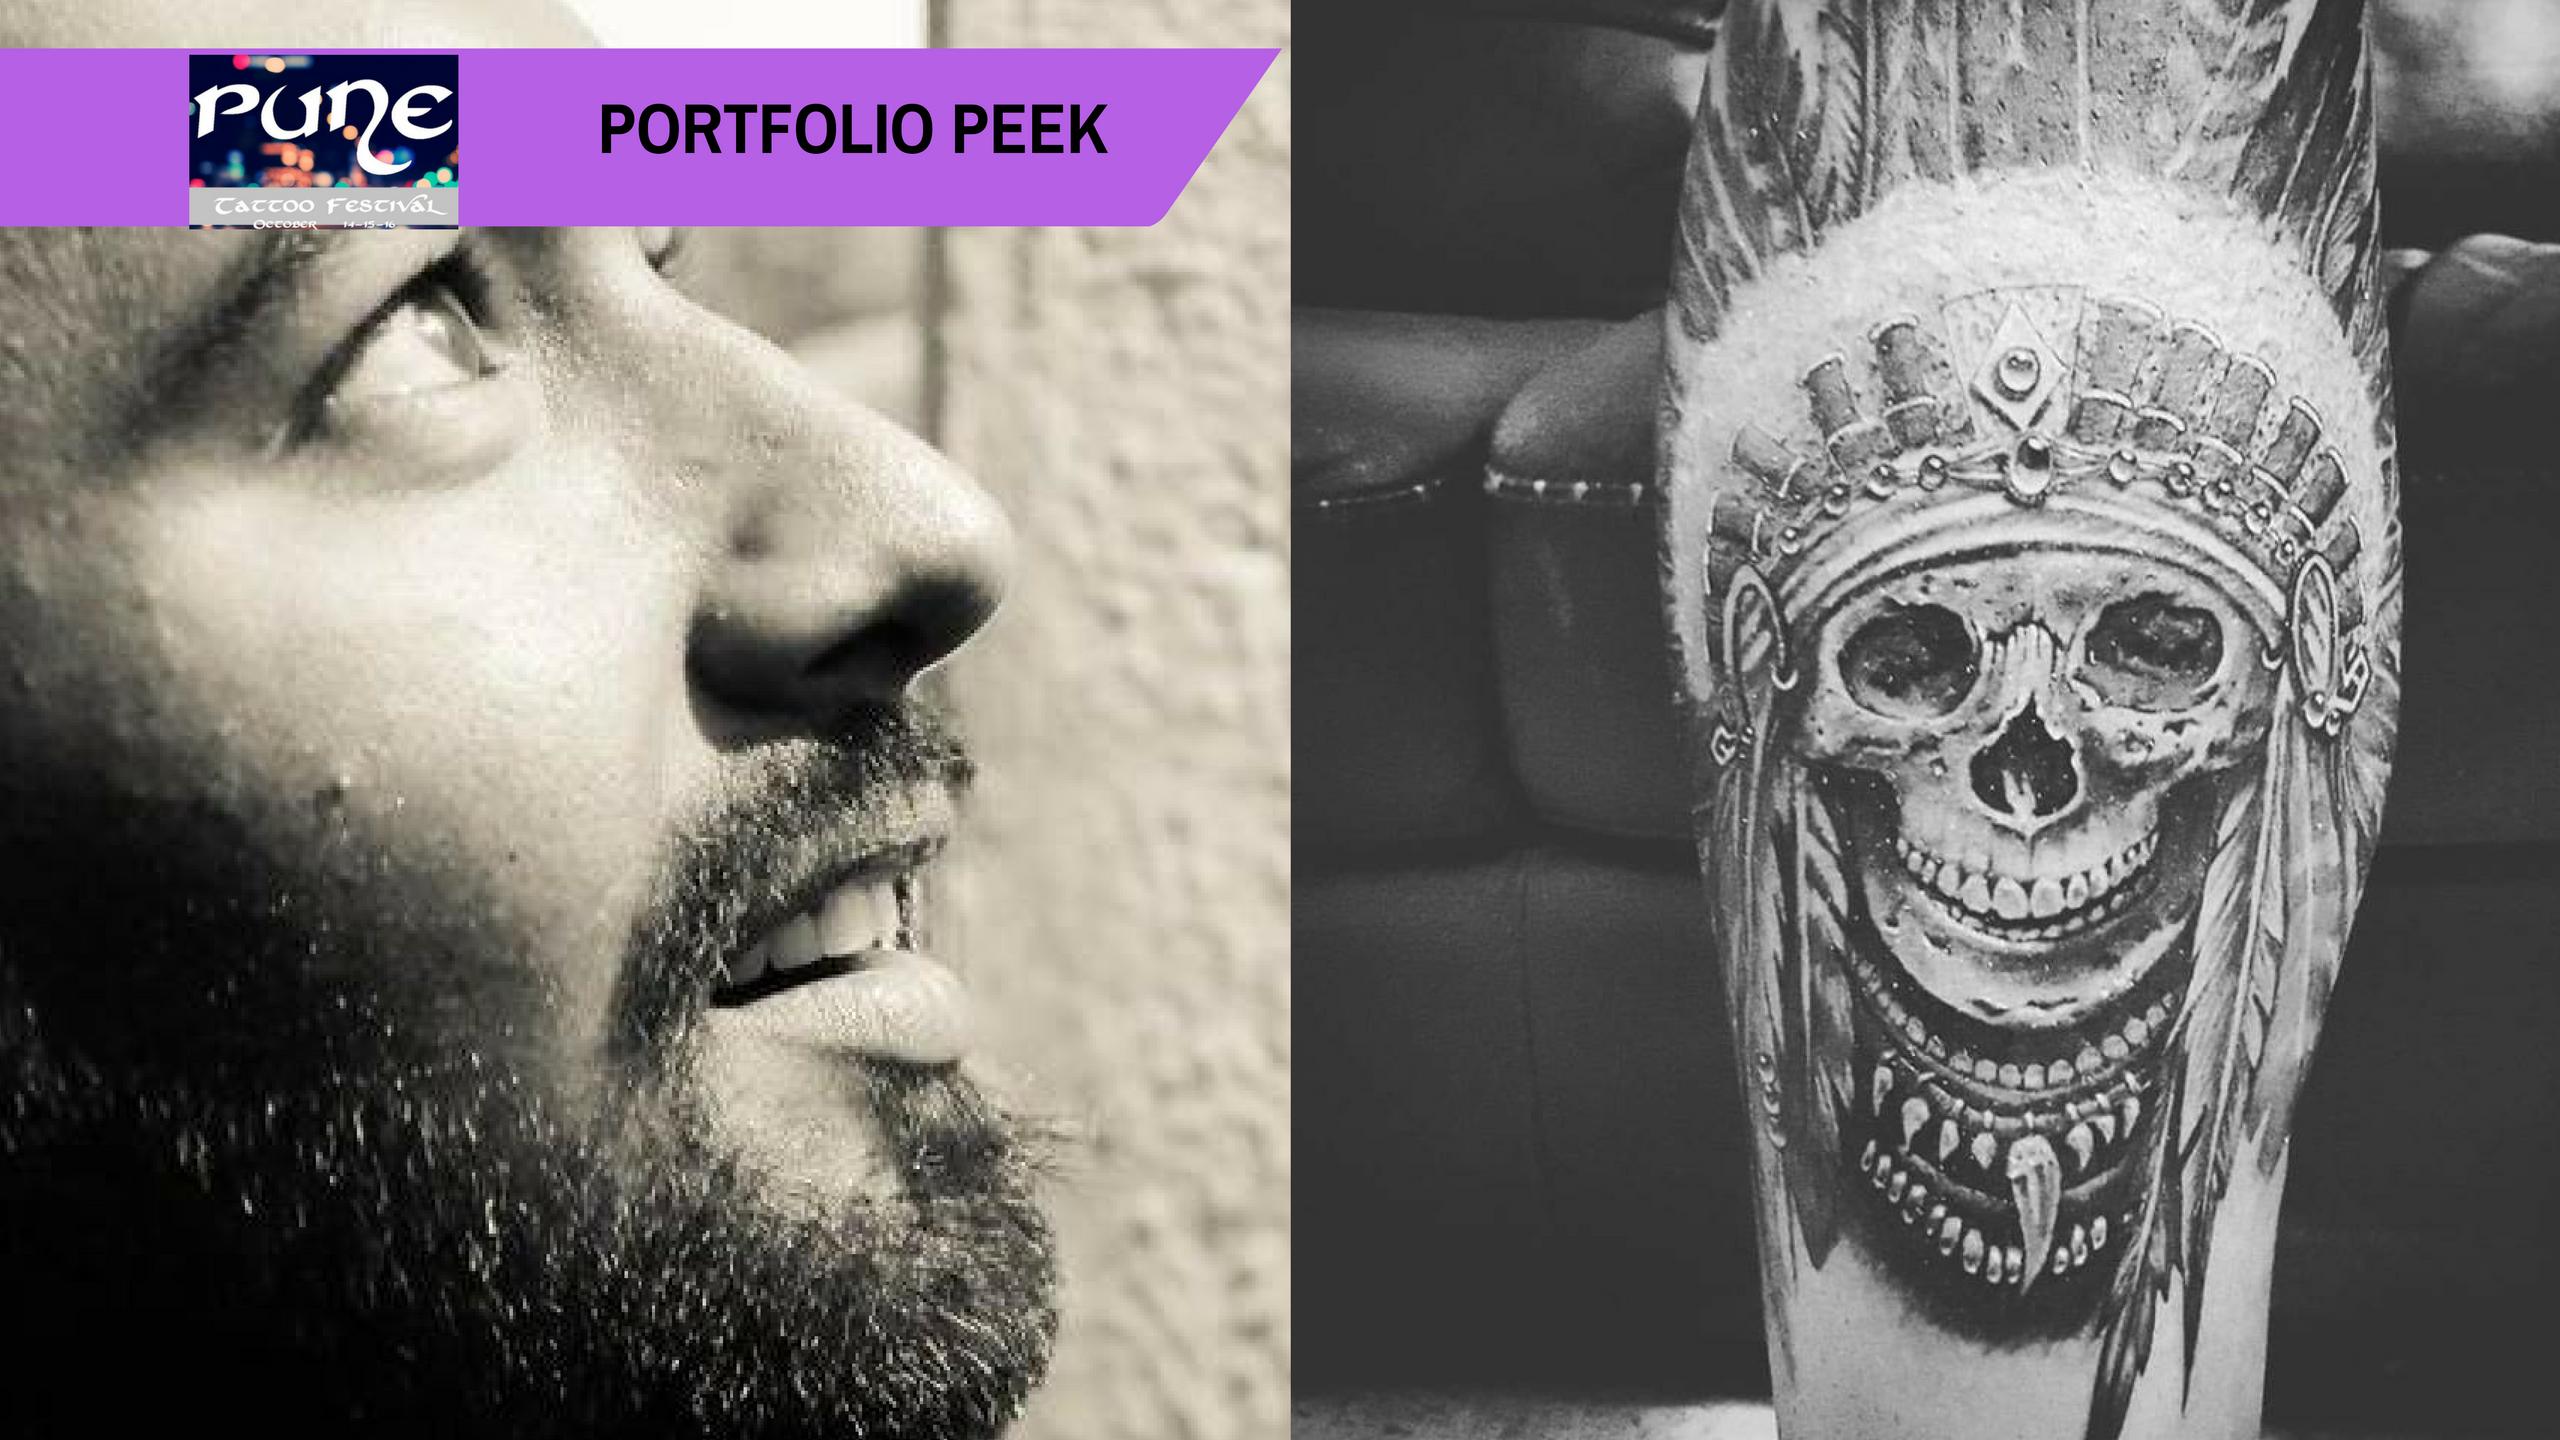 Pune Tattoo Fest Portfolio Peek: The ol' school, yet adapting Saurabh Pardeshi